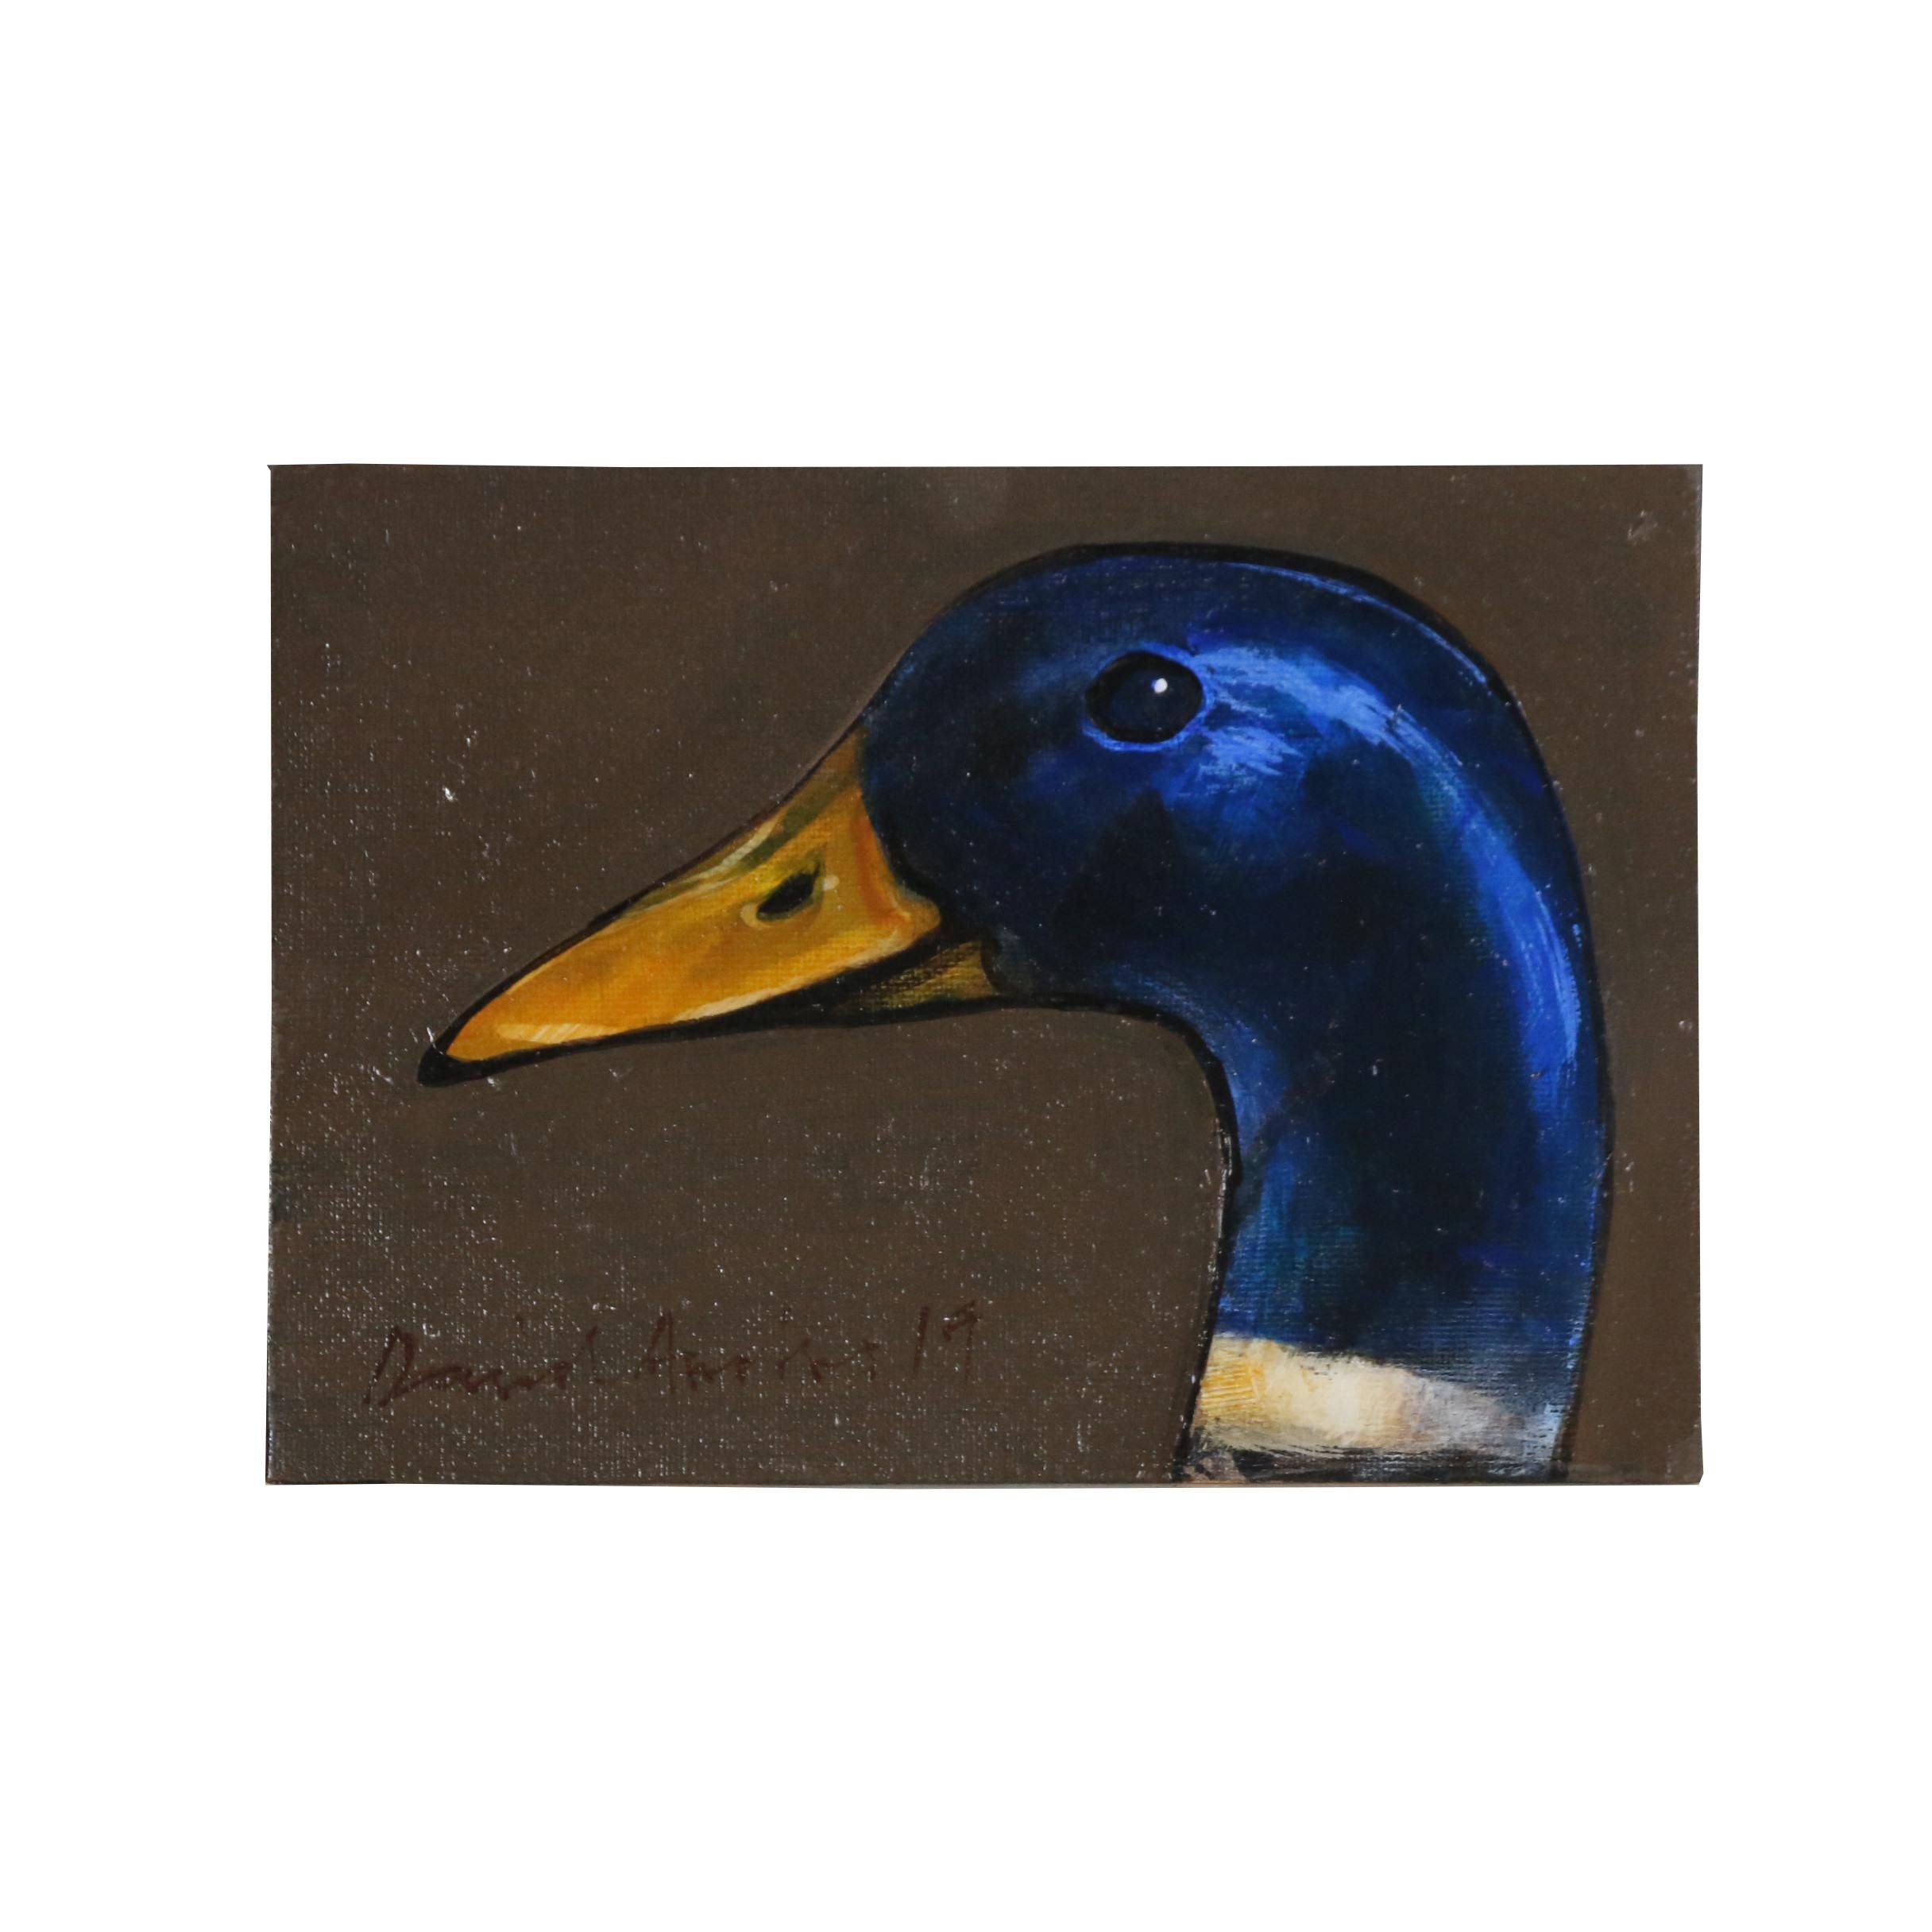 David Andrews Oil Painting of Blue Headed Mallard